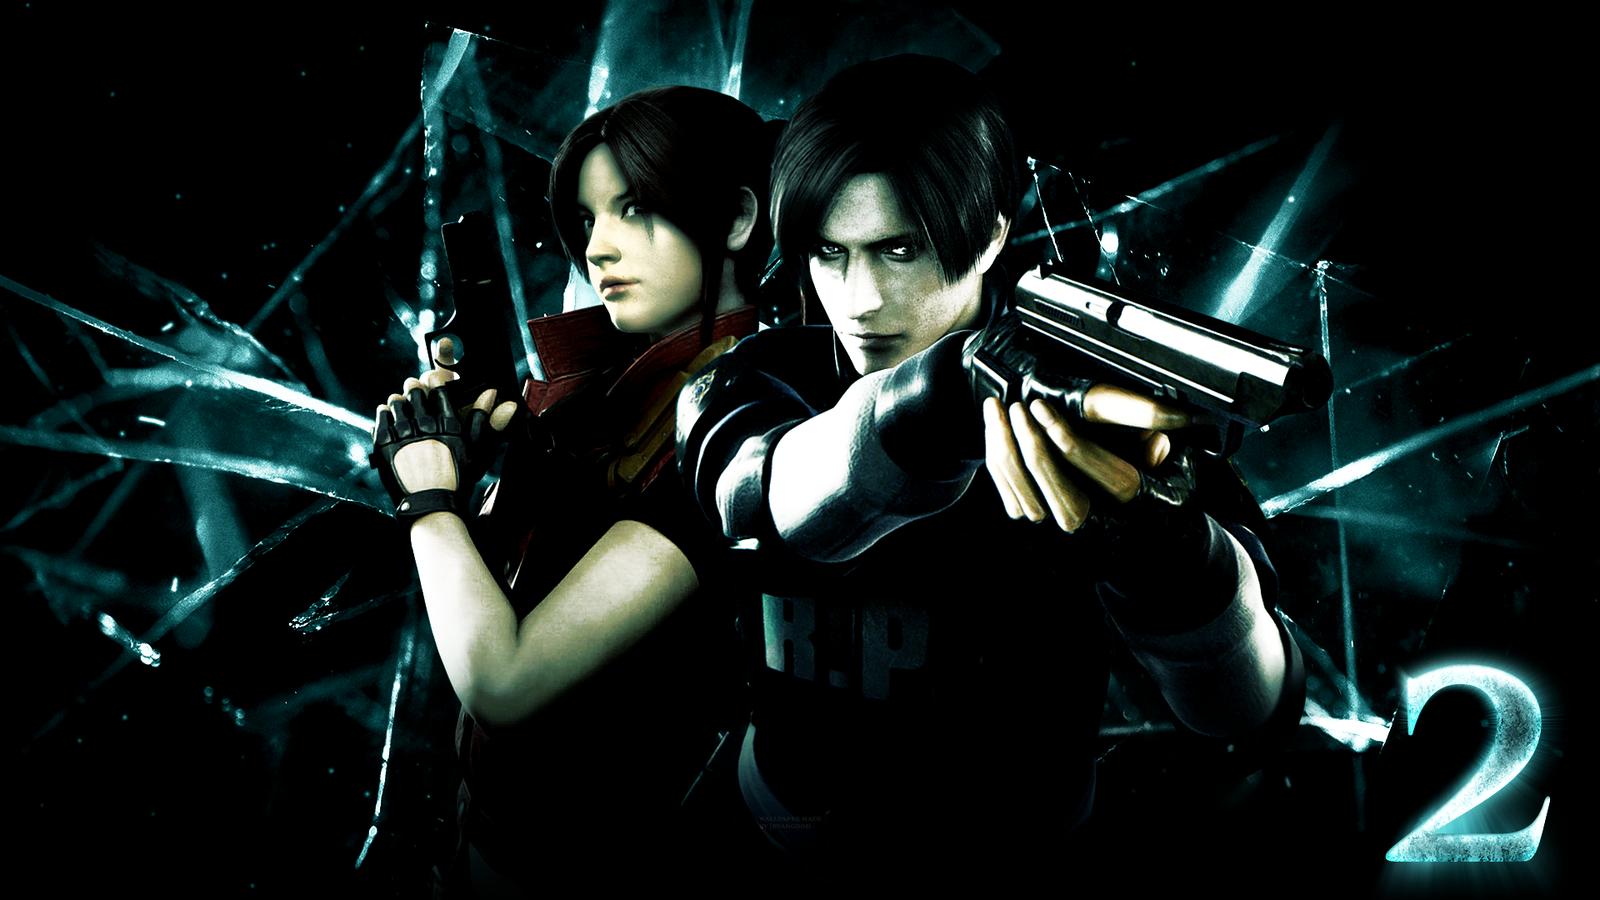 Hd wallpaper resident evil - Resident Evil Operation Raccoon City Hd Desktop Wallpaper High